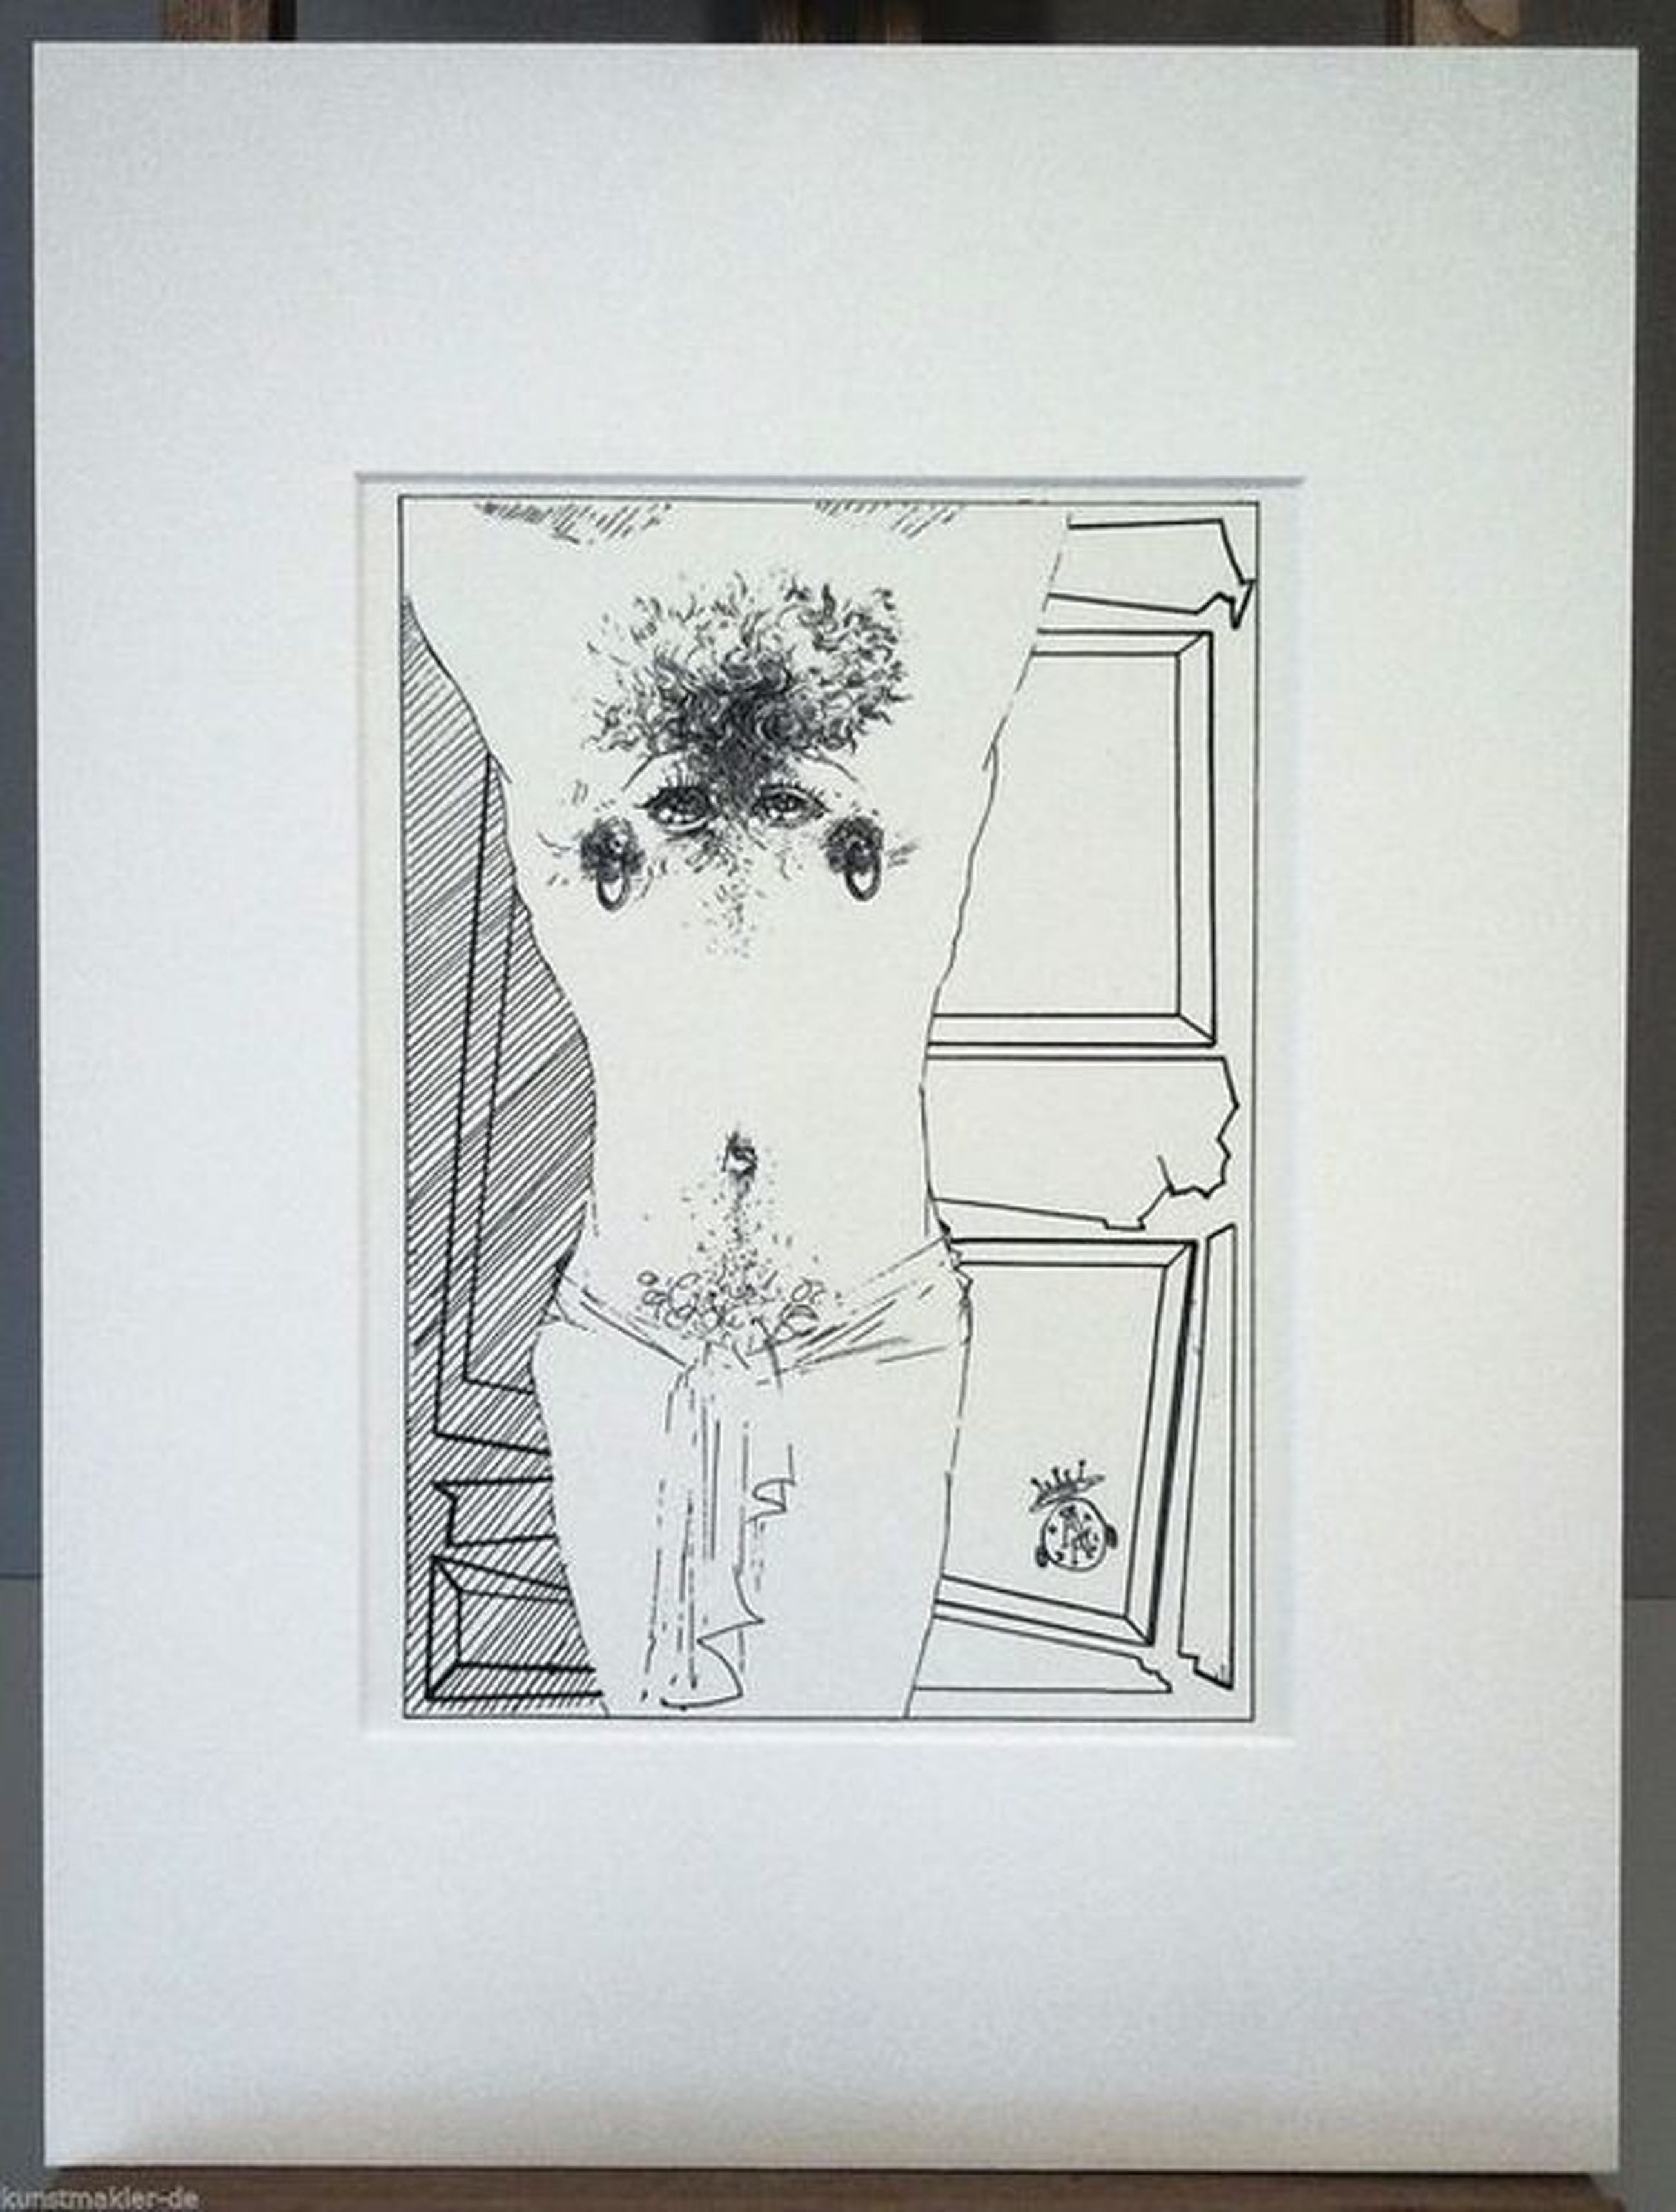 Salvador Dali - Pierced Upper Body - Lithografie - Oplage 2500 - 1944 kopen? Bied vanaf 1!